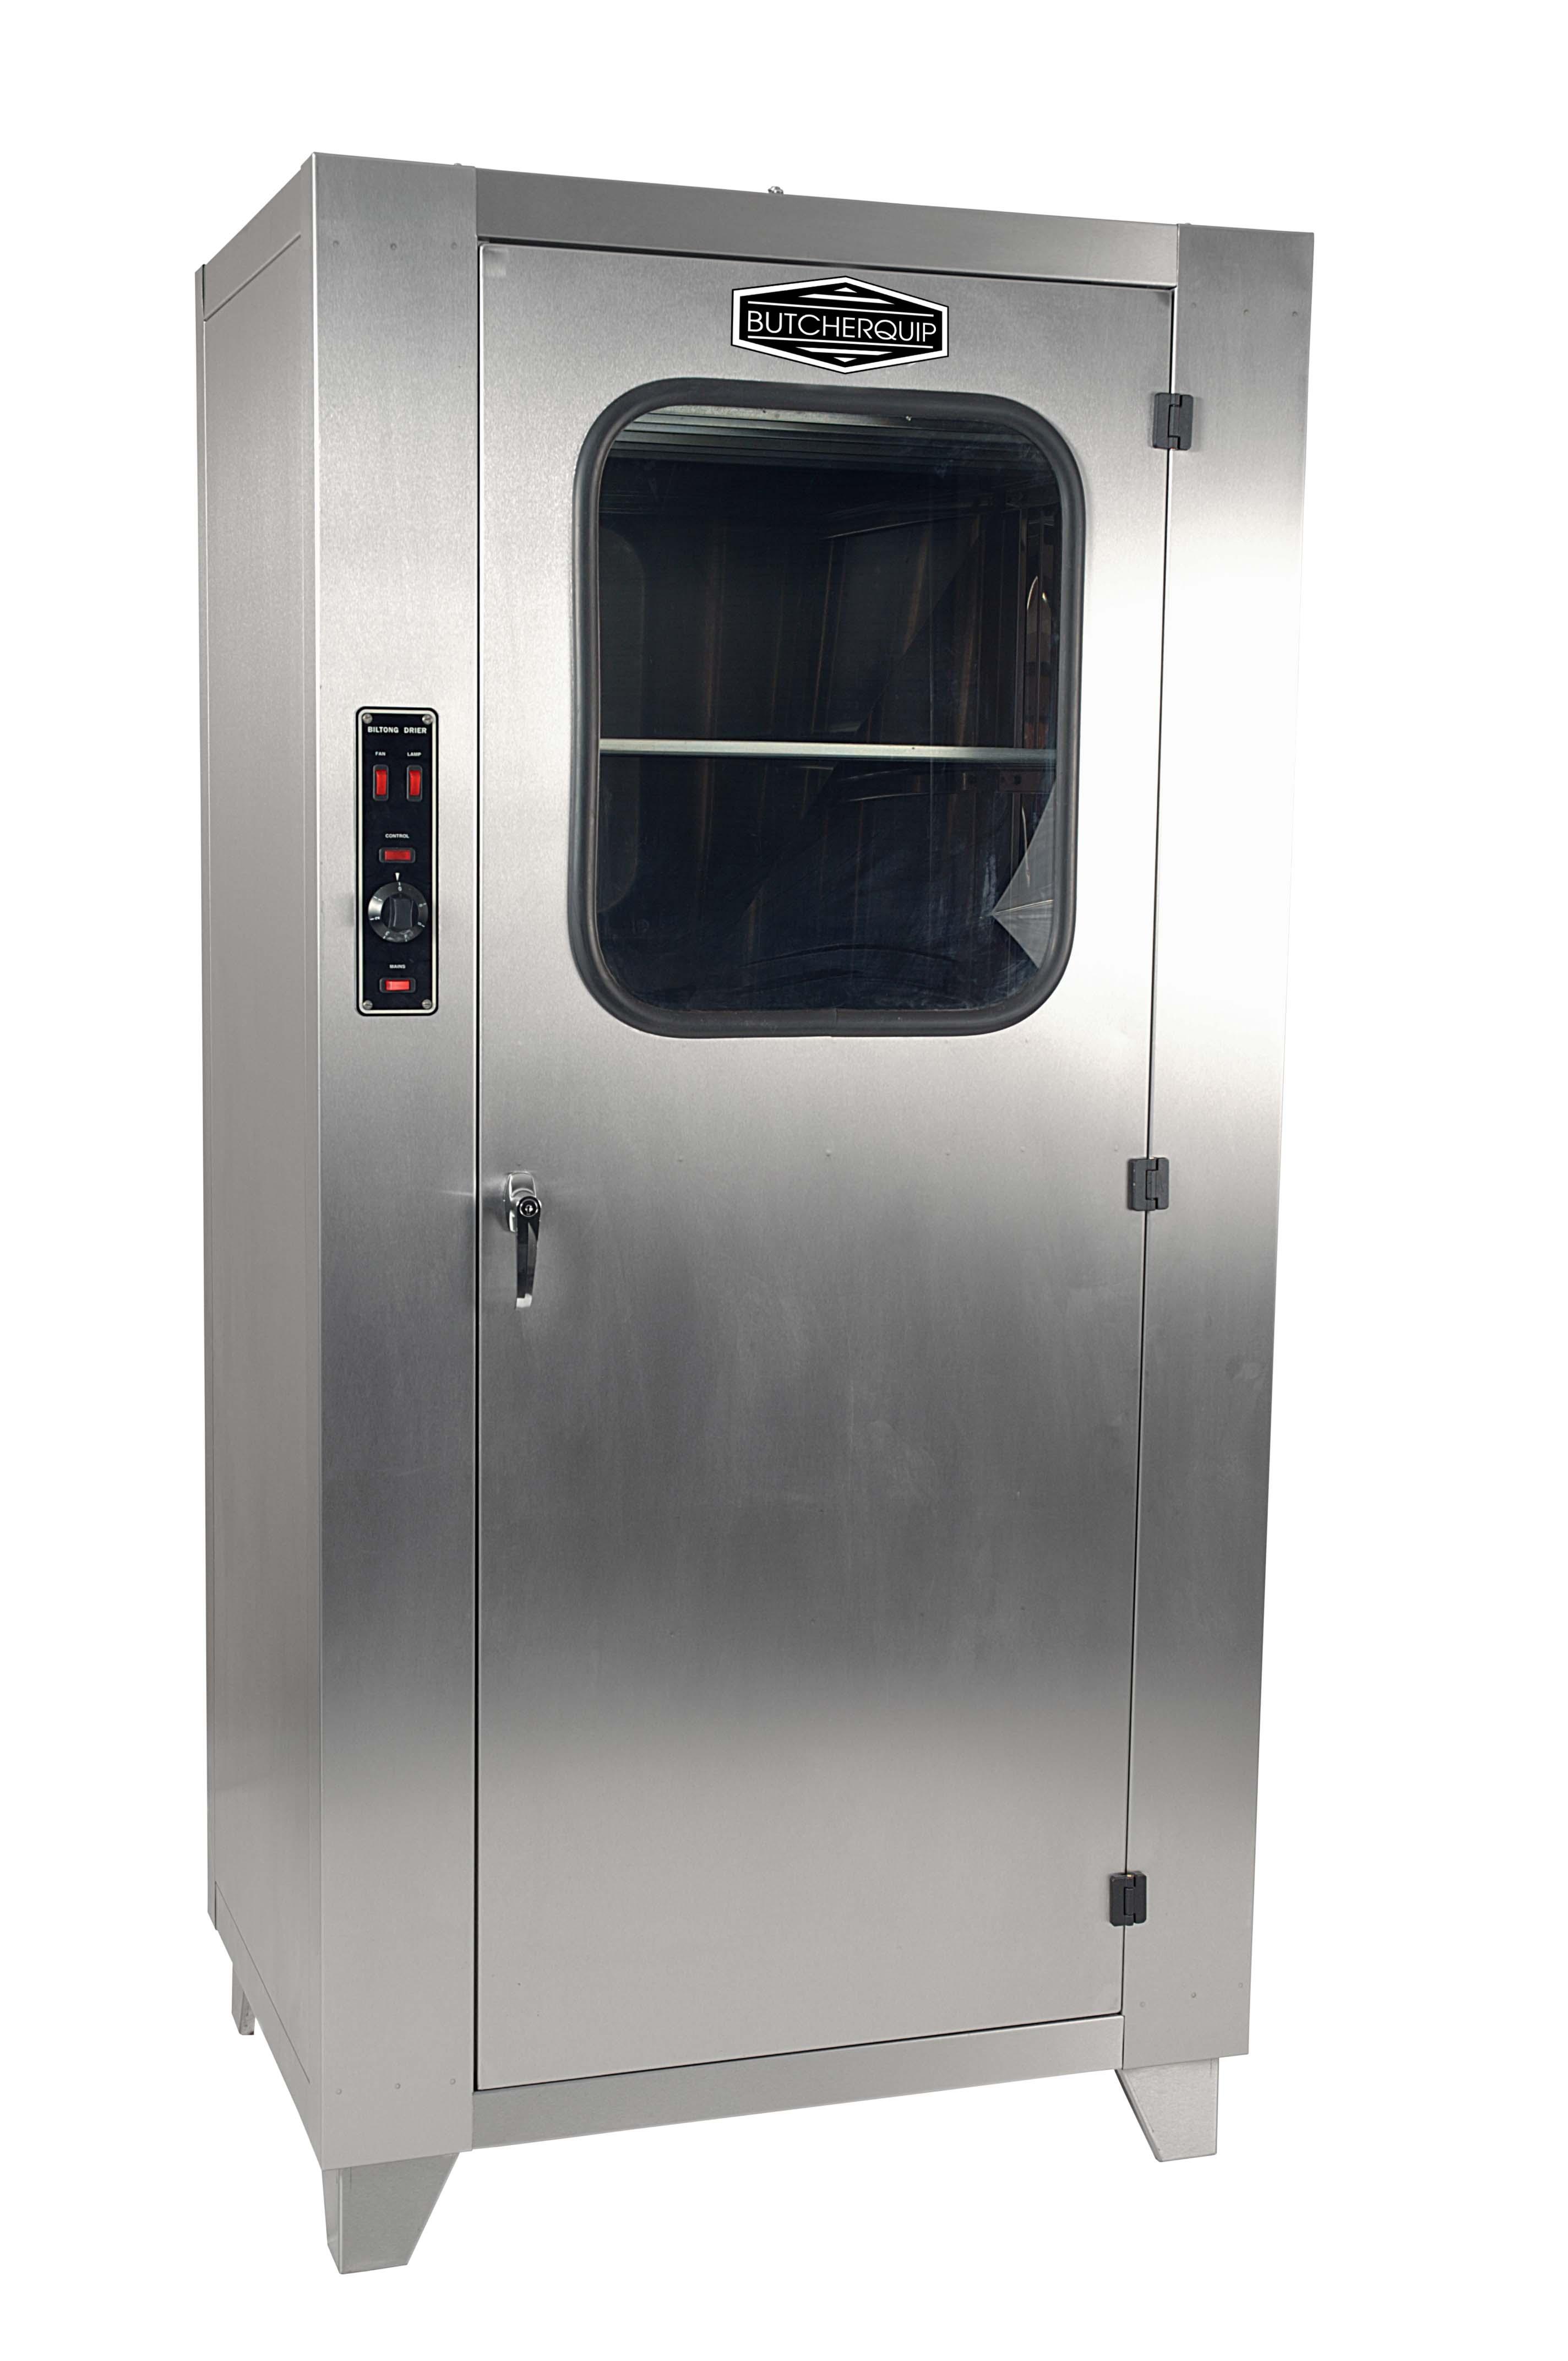 bcb1250--biltong-cabinet-butcherquip--1250lt--stainless-steel